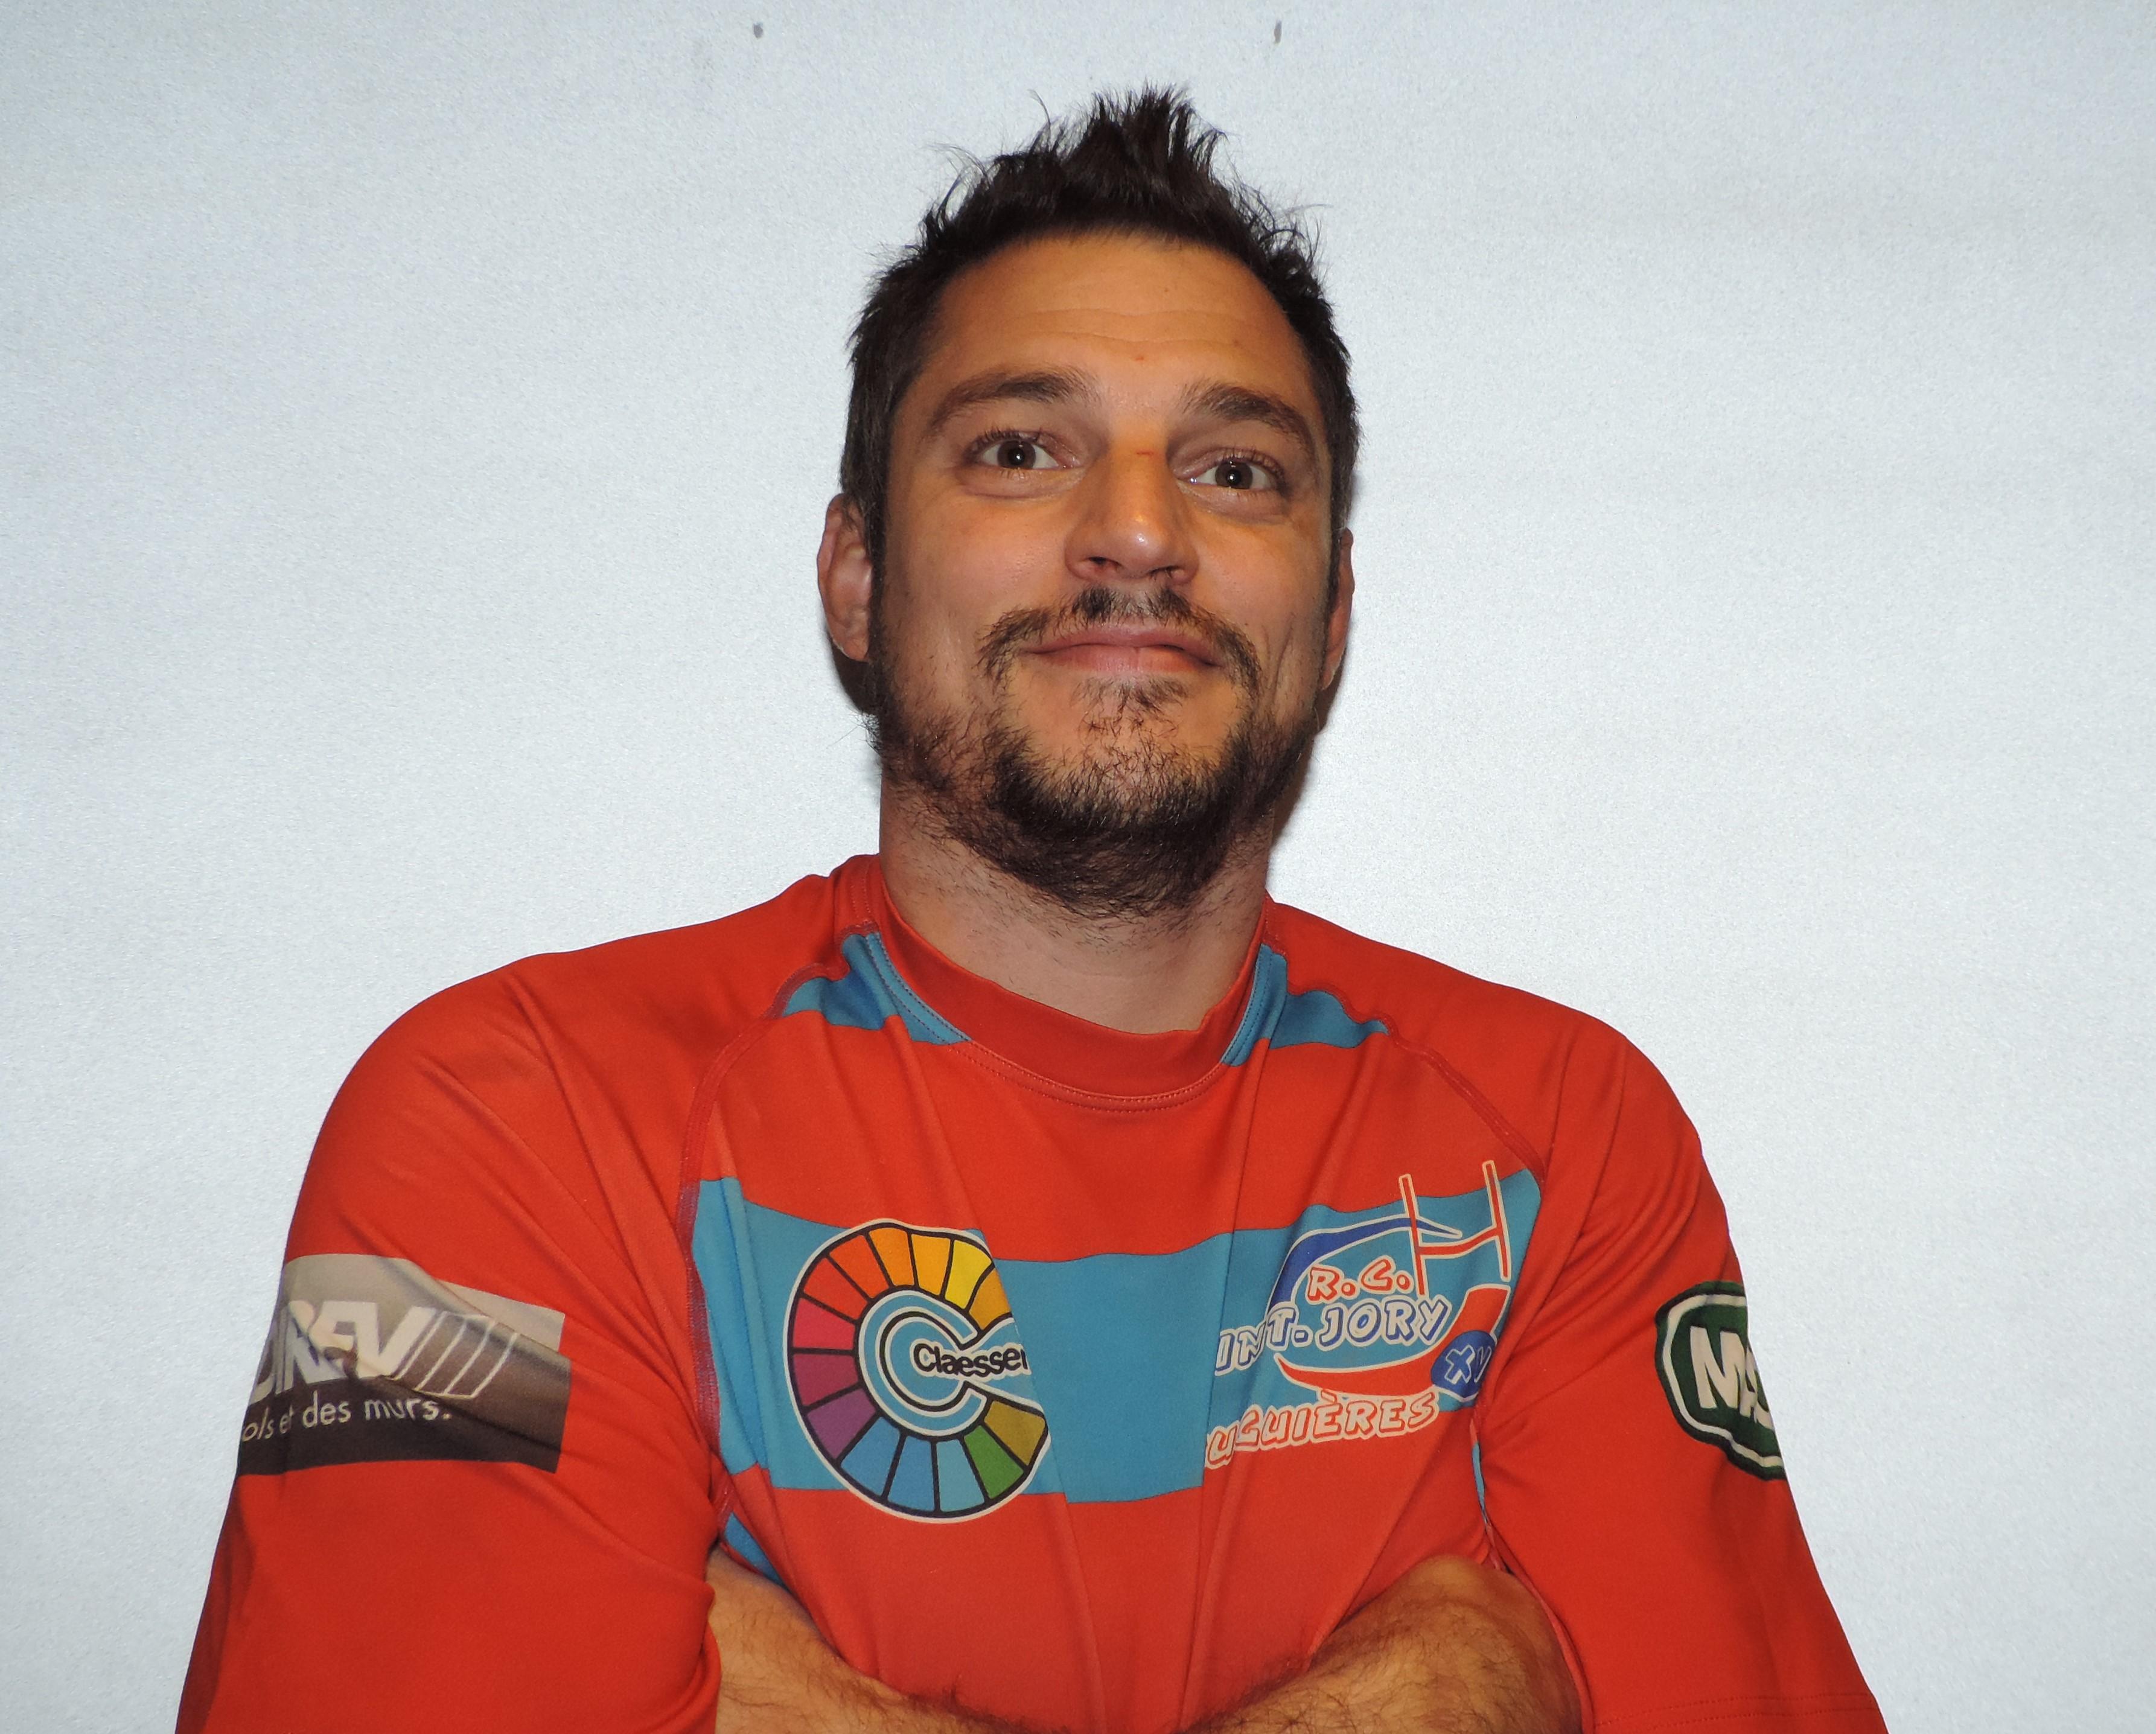 Arnaud GALEY